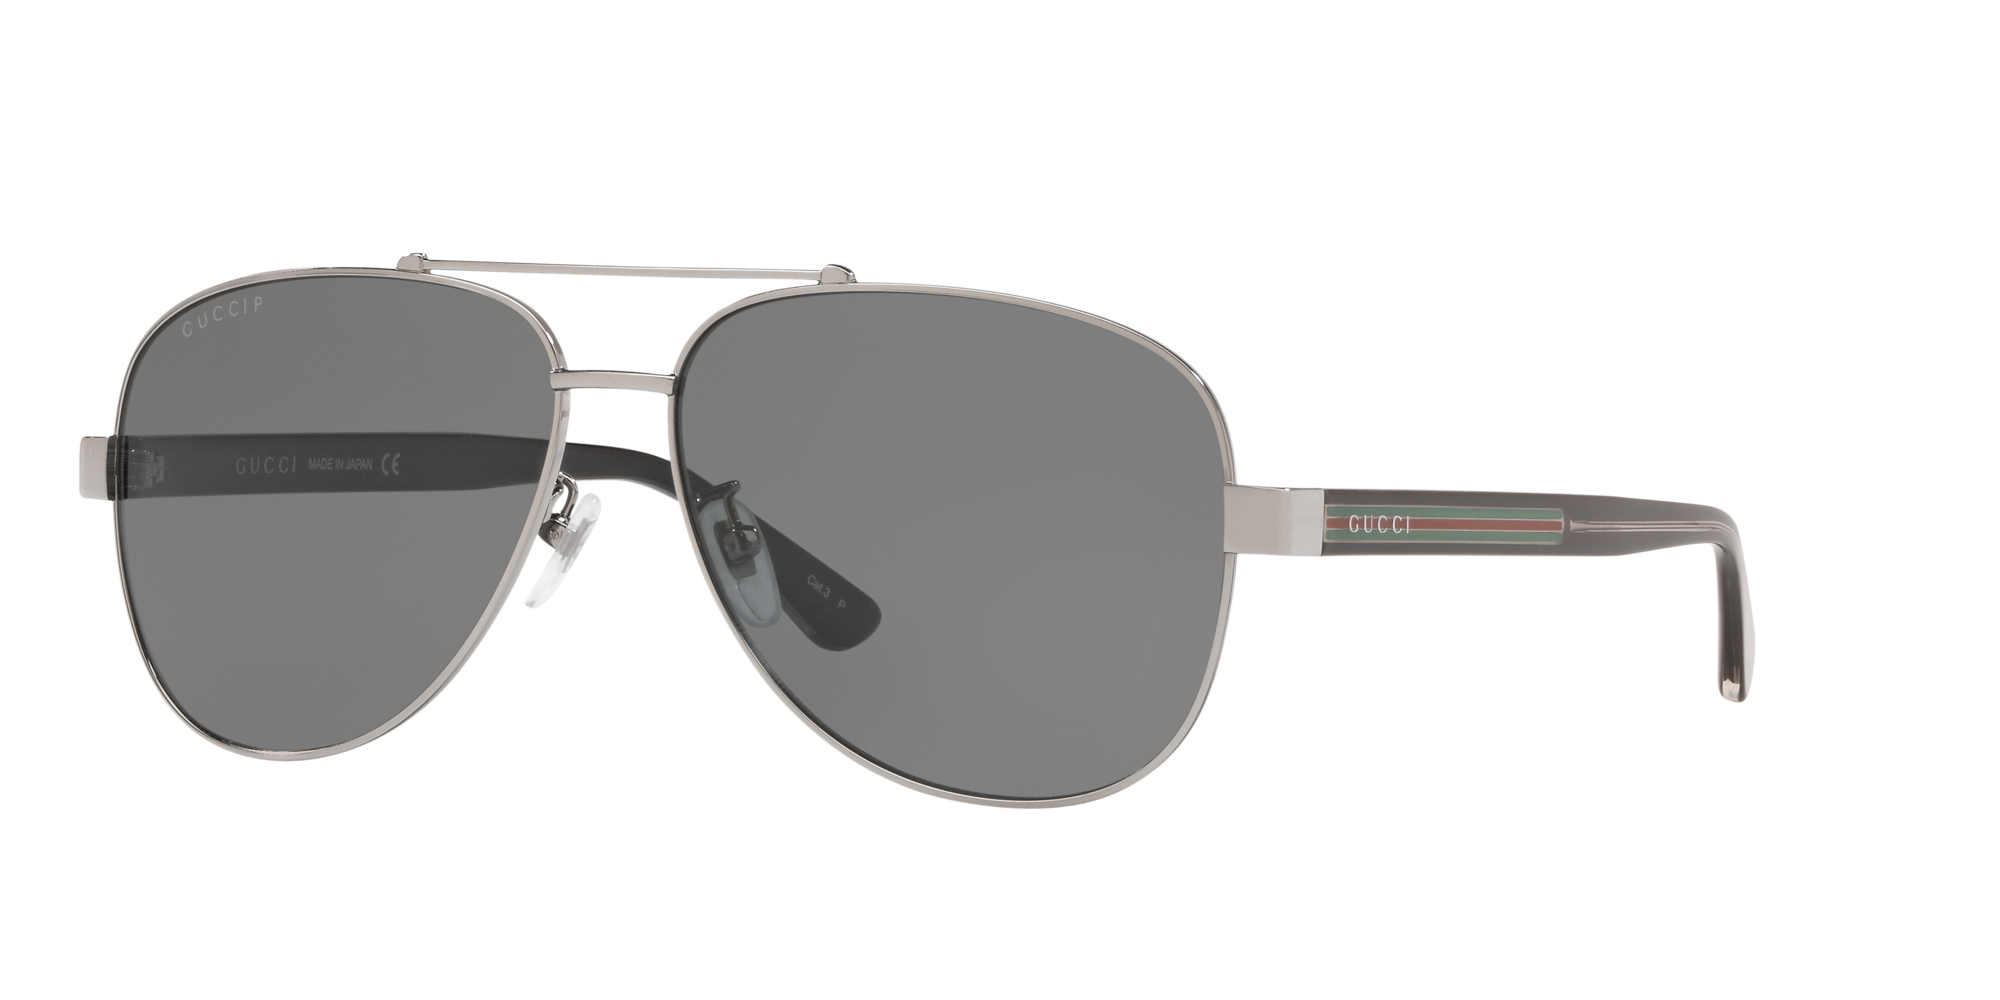 Gucci Man Gg0528s - Frame color: Silver, Lens color: Grey-Black, Size 63-14/150